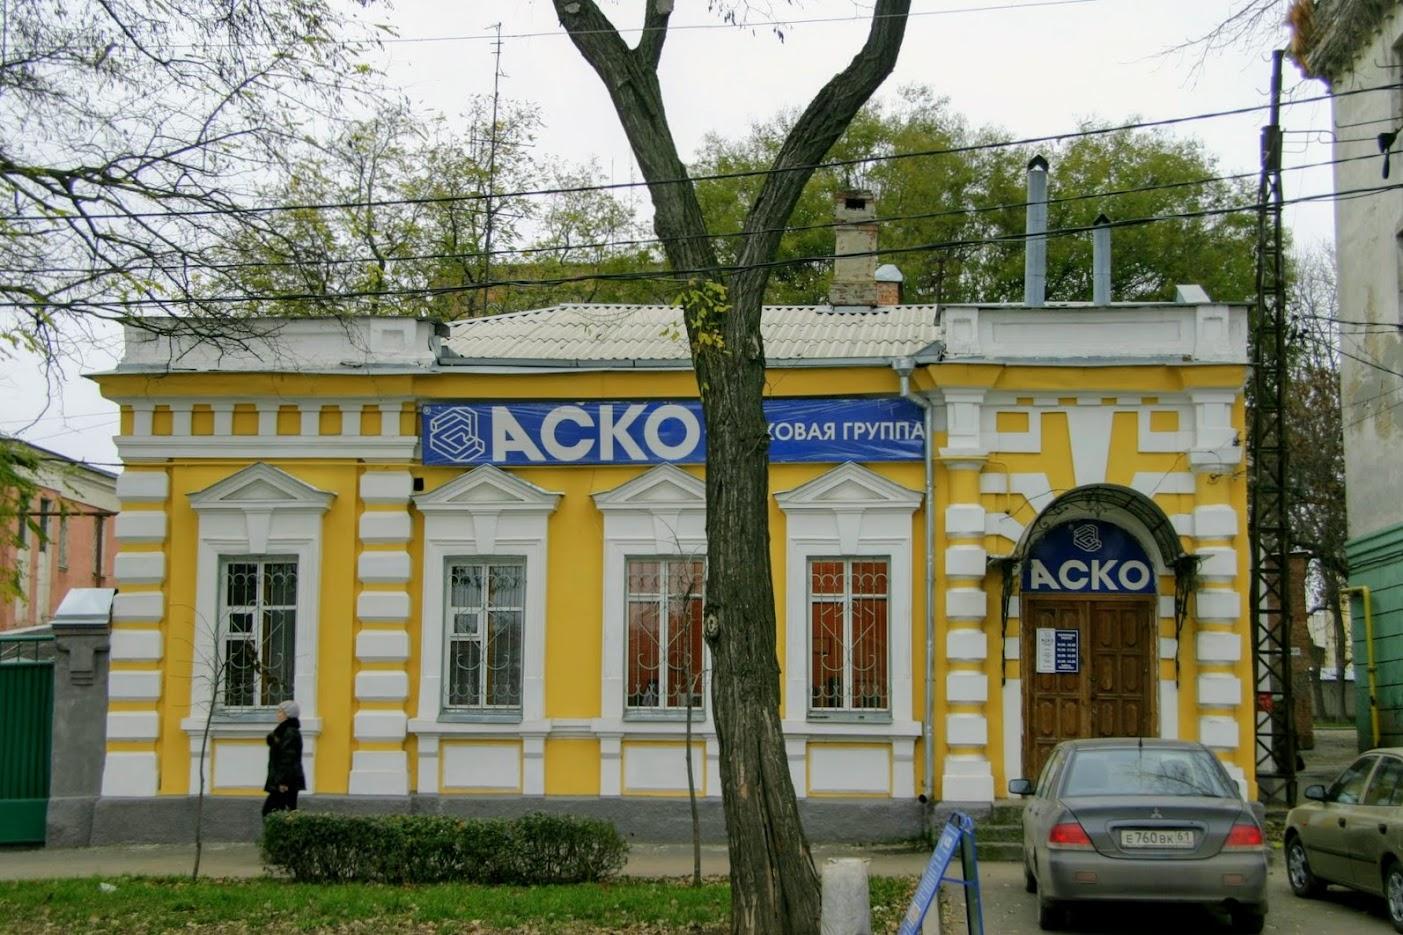 https://sites.google.com/site/istoriceskijtaganrog/cehova-ulica/dom-74